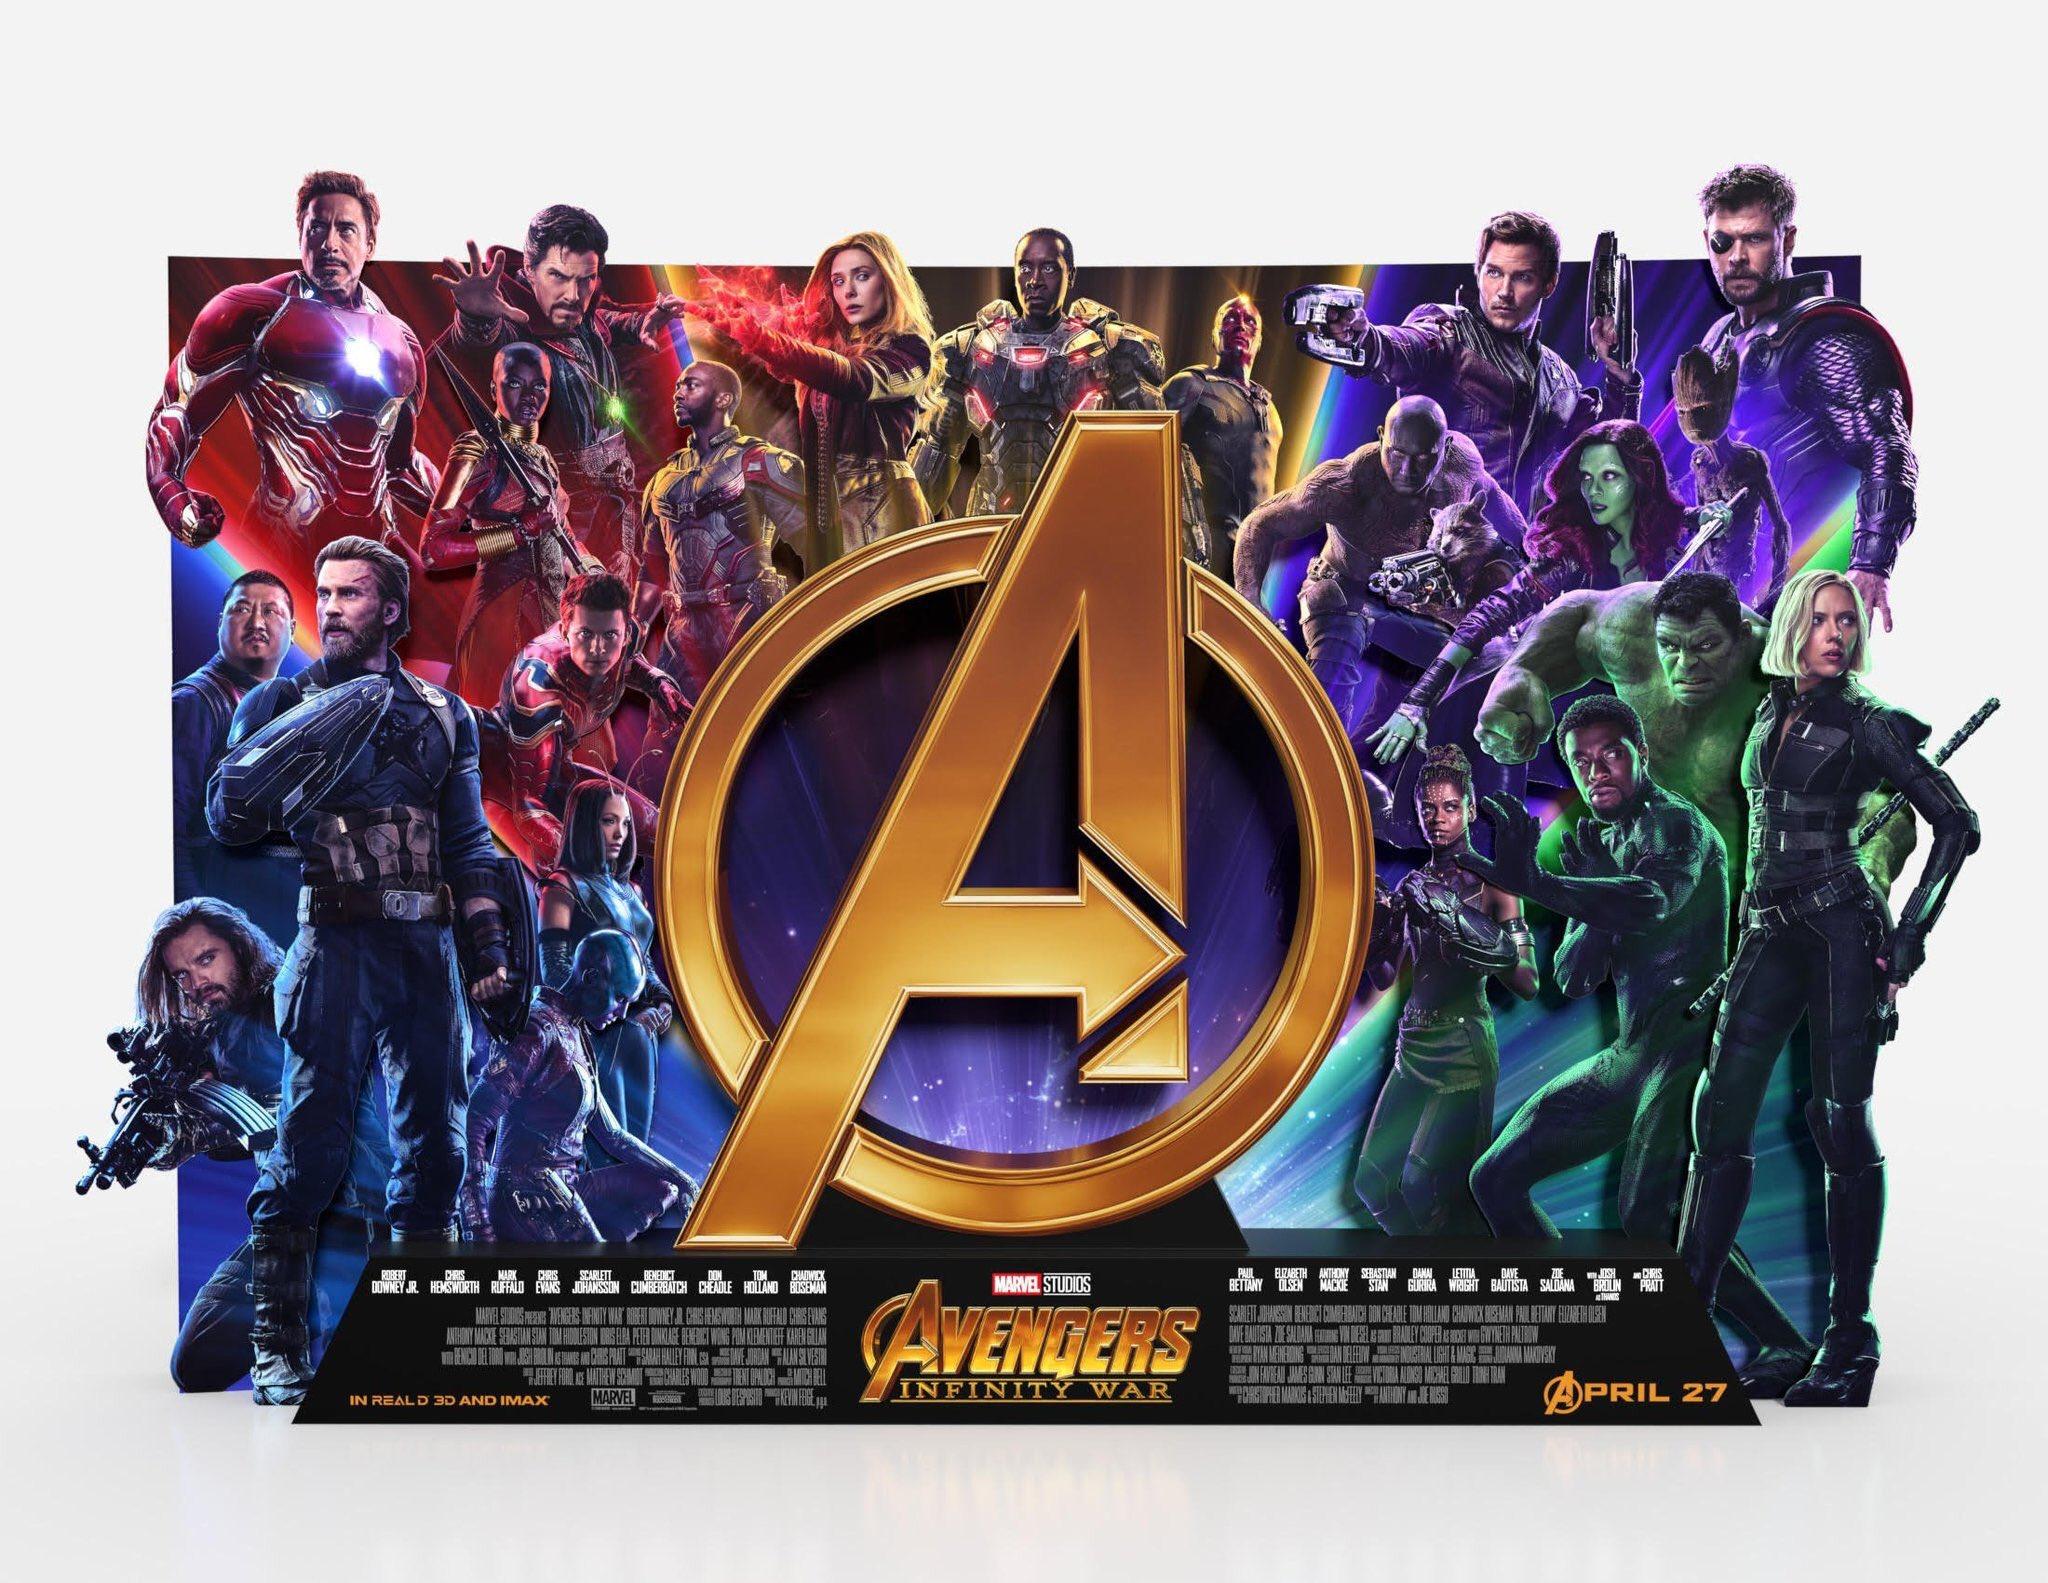 avengers_infinity_war_p10.jpg